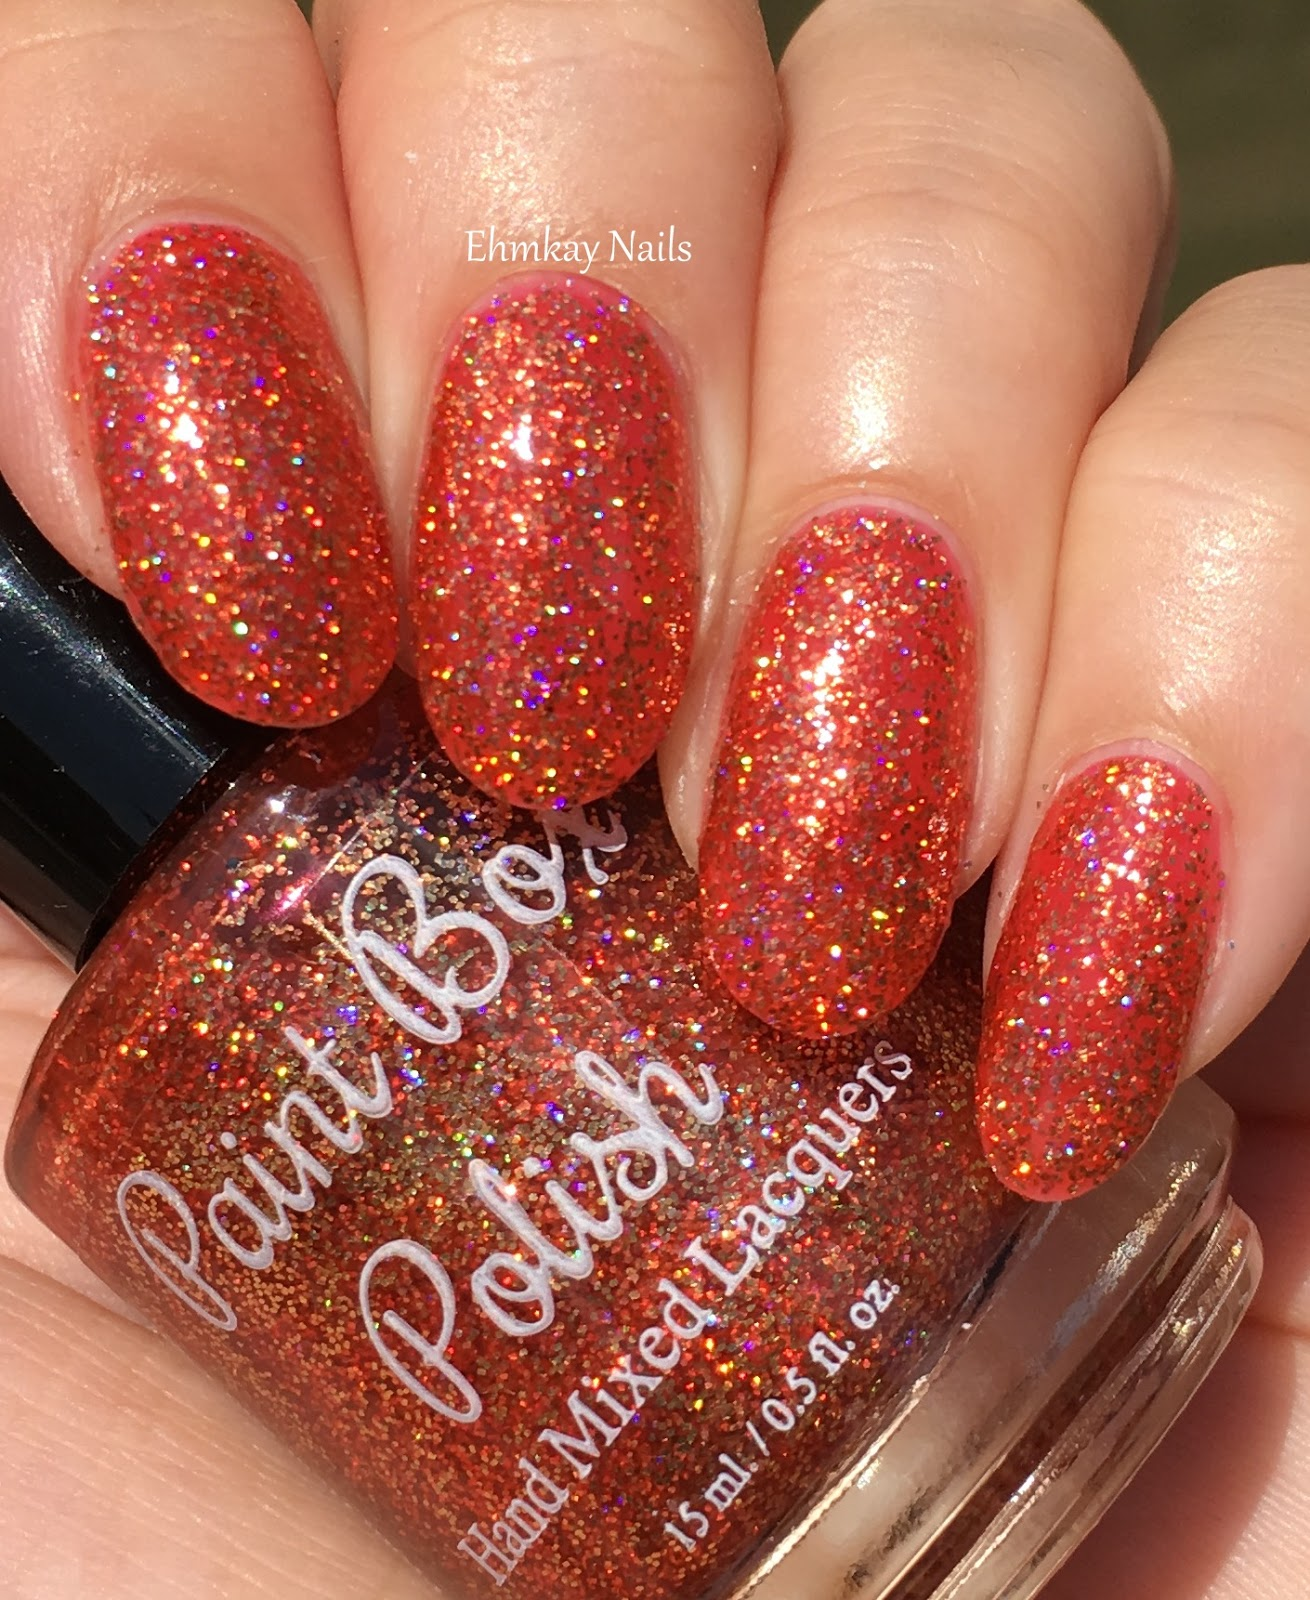 ehmkay nails: Paint Box Polish Westerosi Late Summer Collection